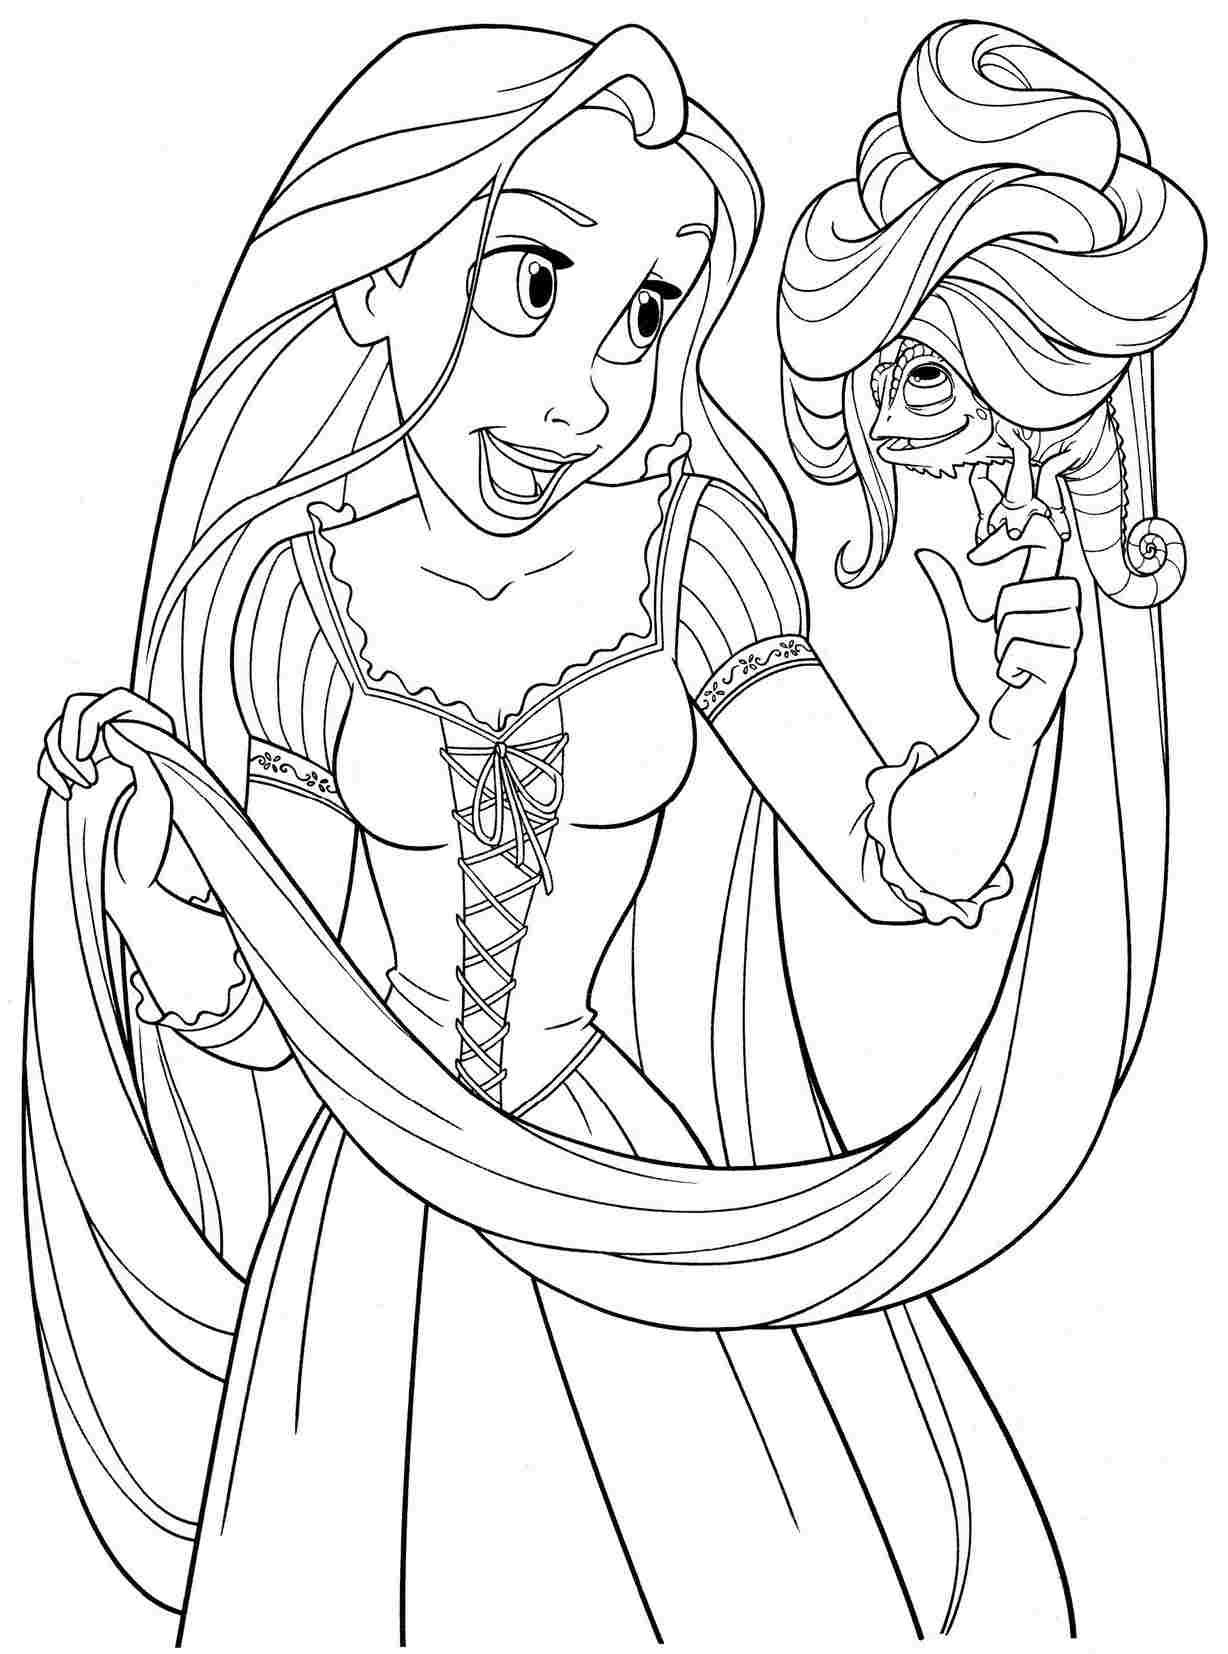 Drawn princess kid coloring page Printable princess colouring for princess